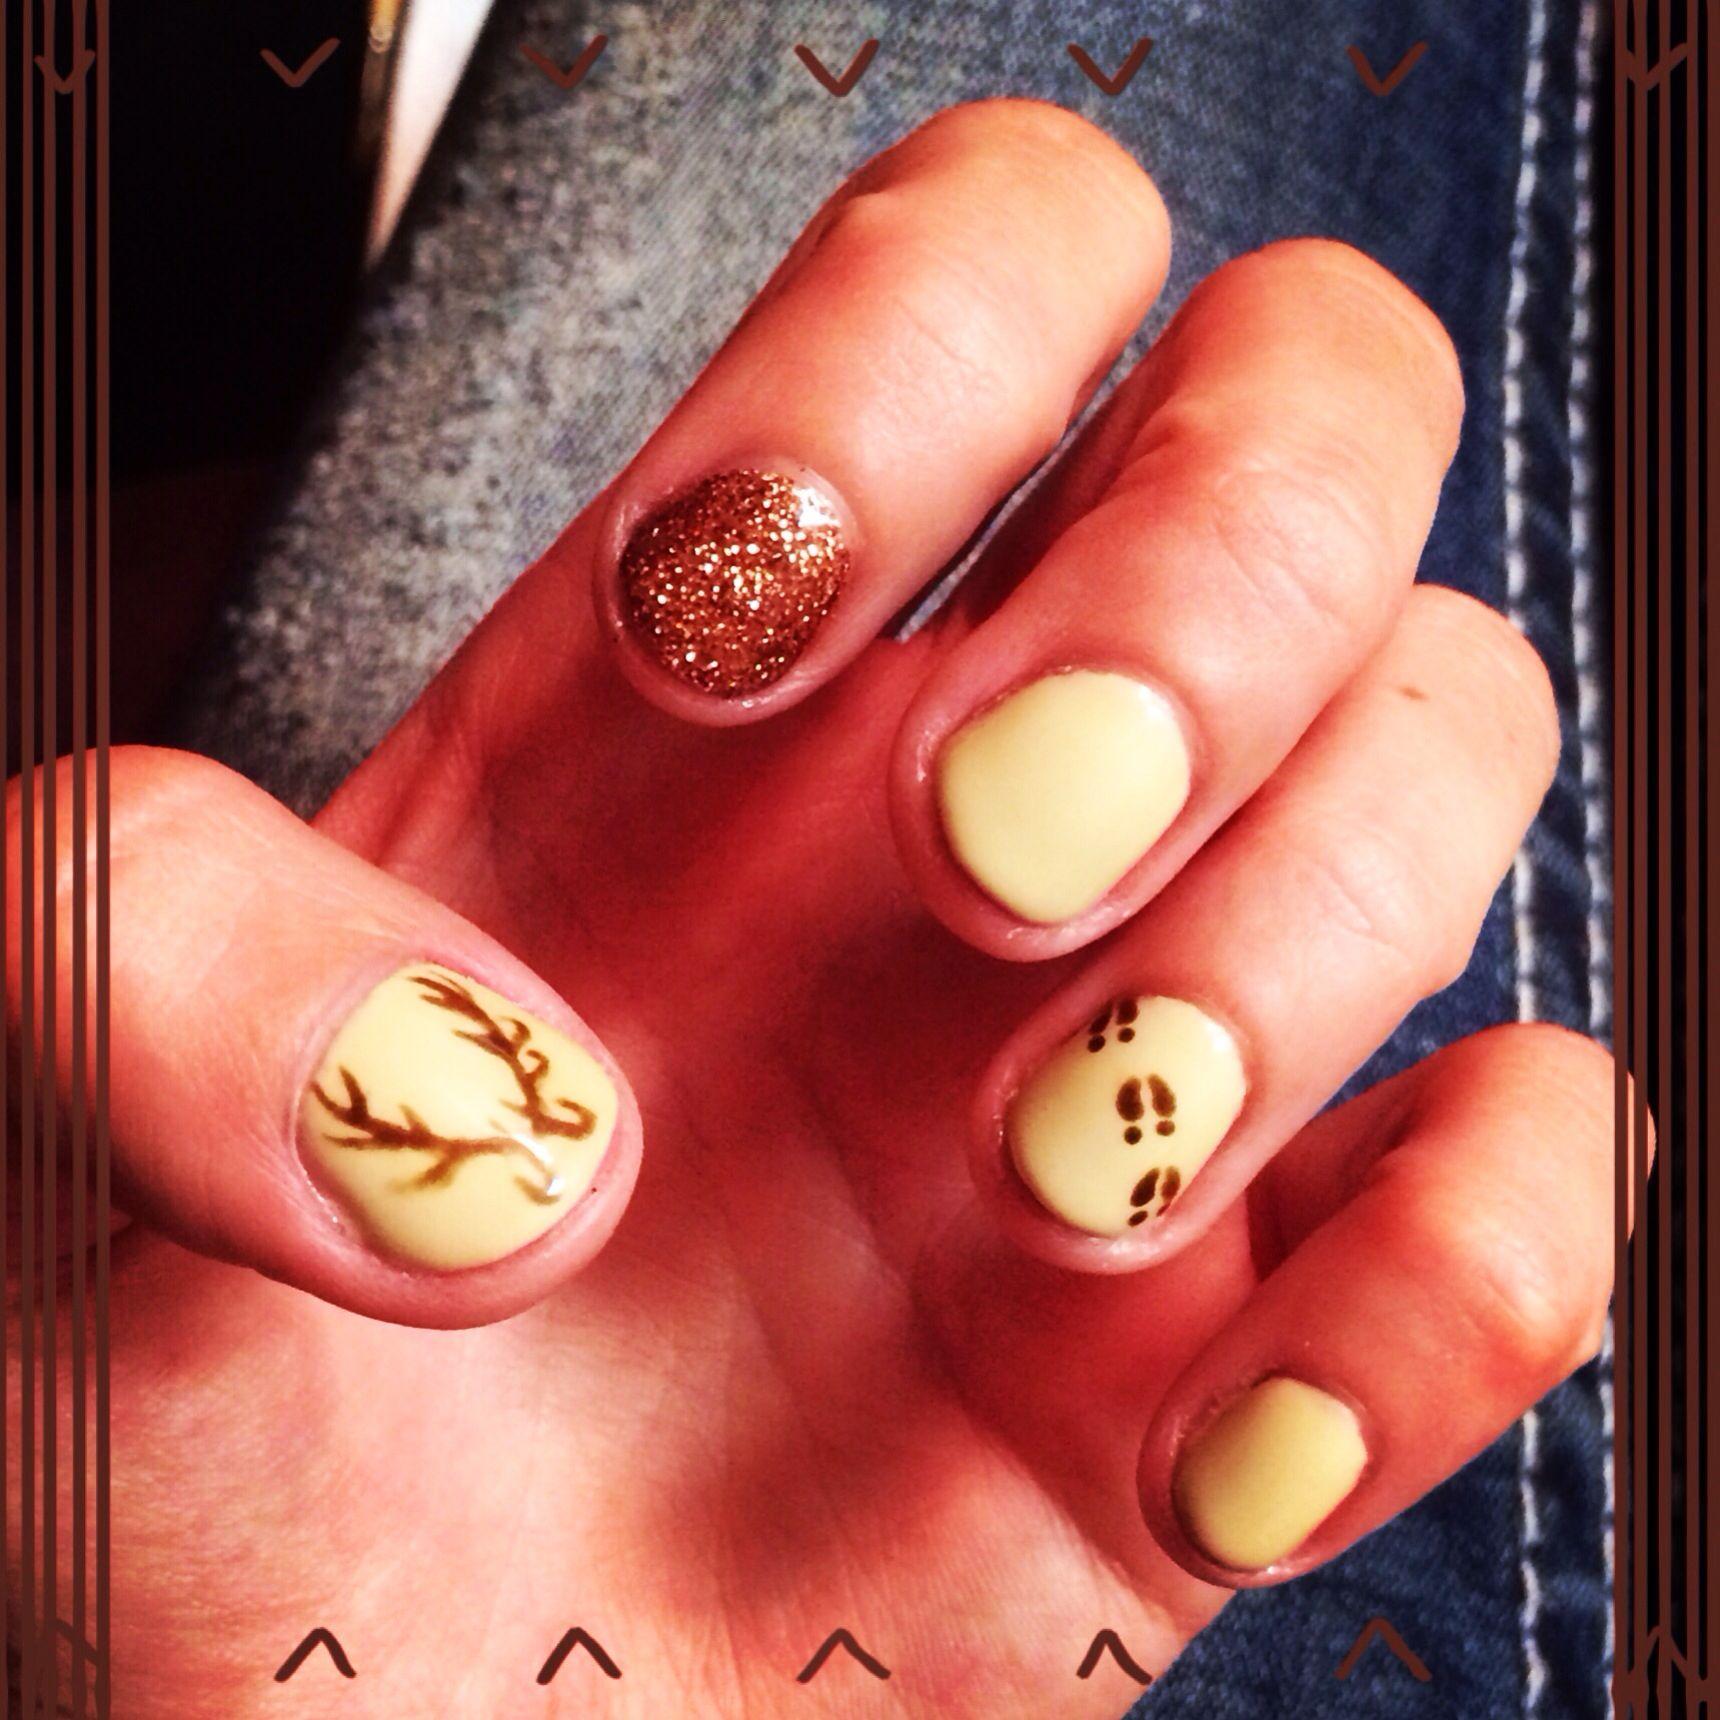 Deer Antler Nails #country | Hair/Nails/Make up | Pinterest | Deer ...